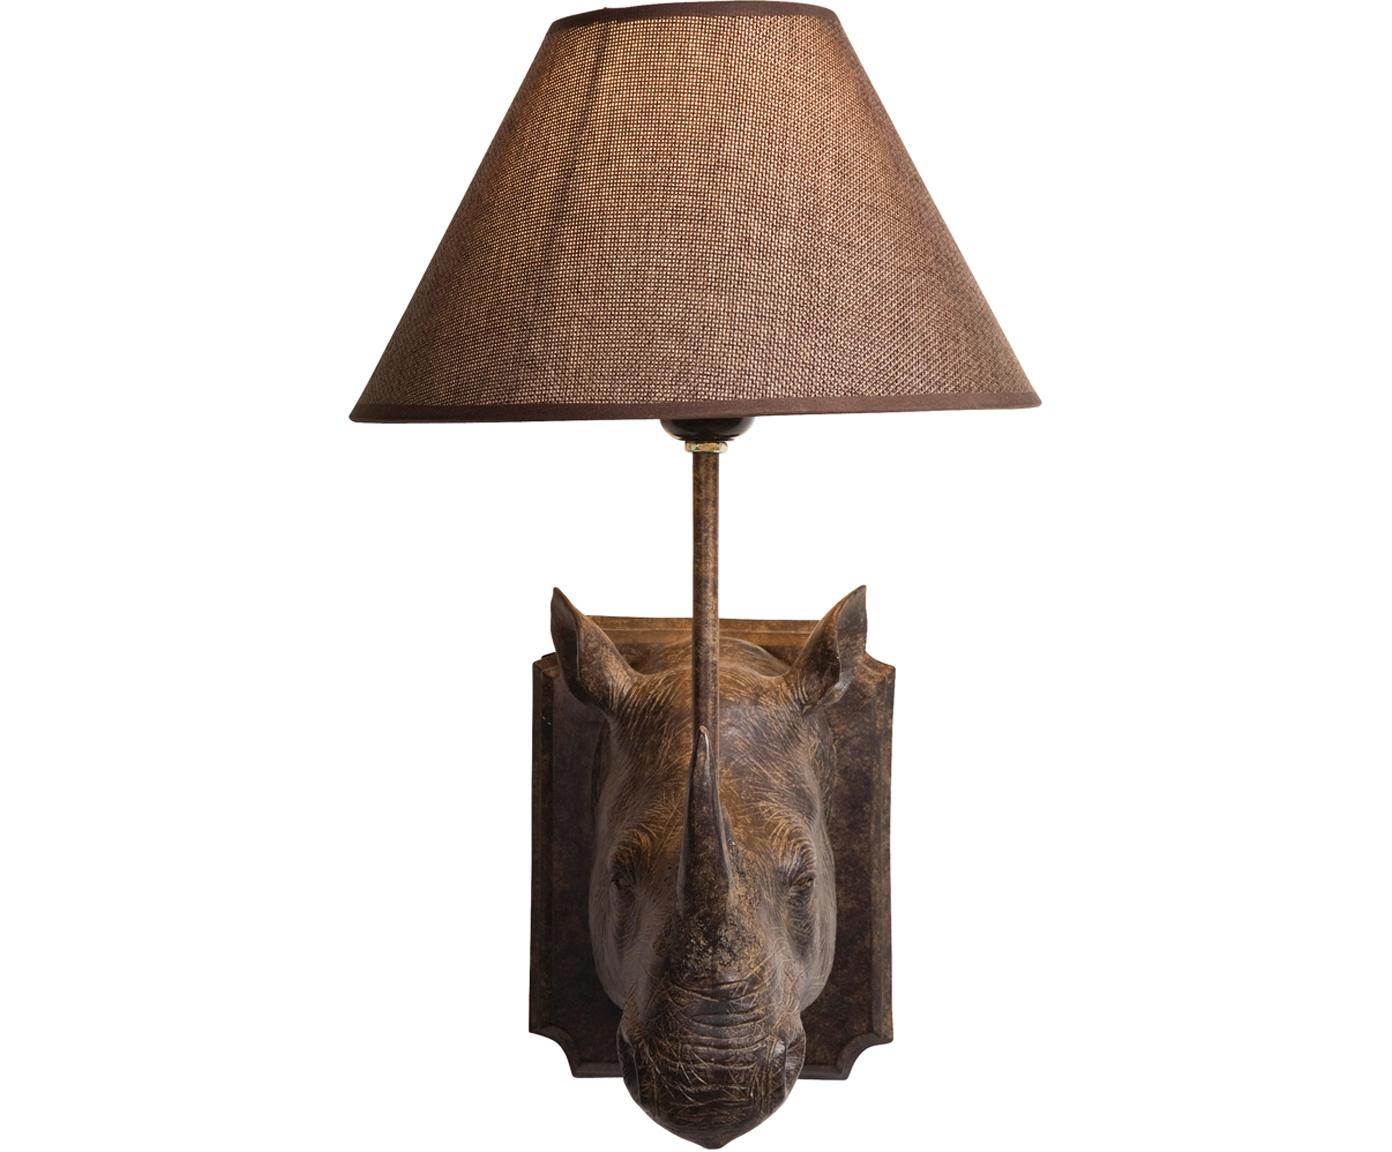 Applique con spina Rhino, Struttura: poliresina, Paralume: acciaio, lino, Marrone, Larg. 27 x Alt. 40 cm